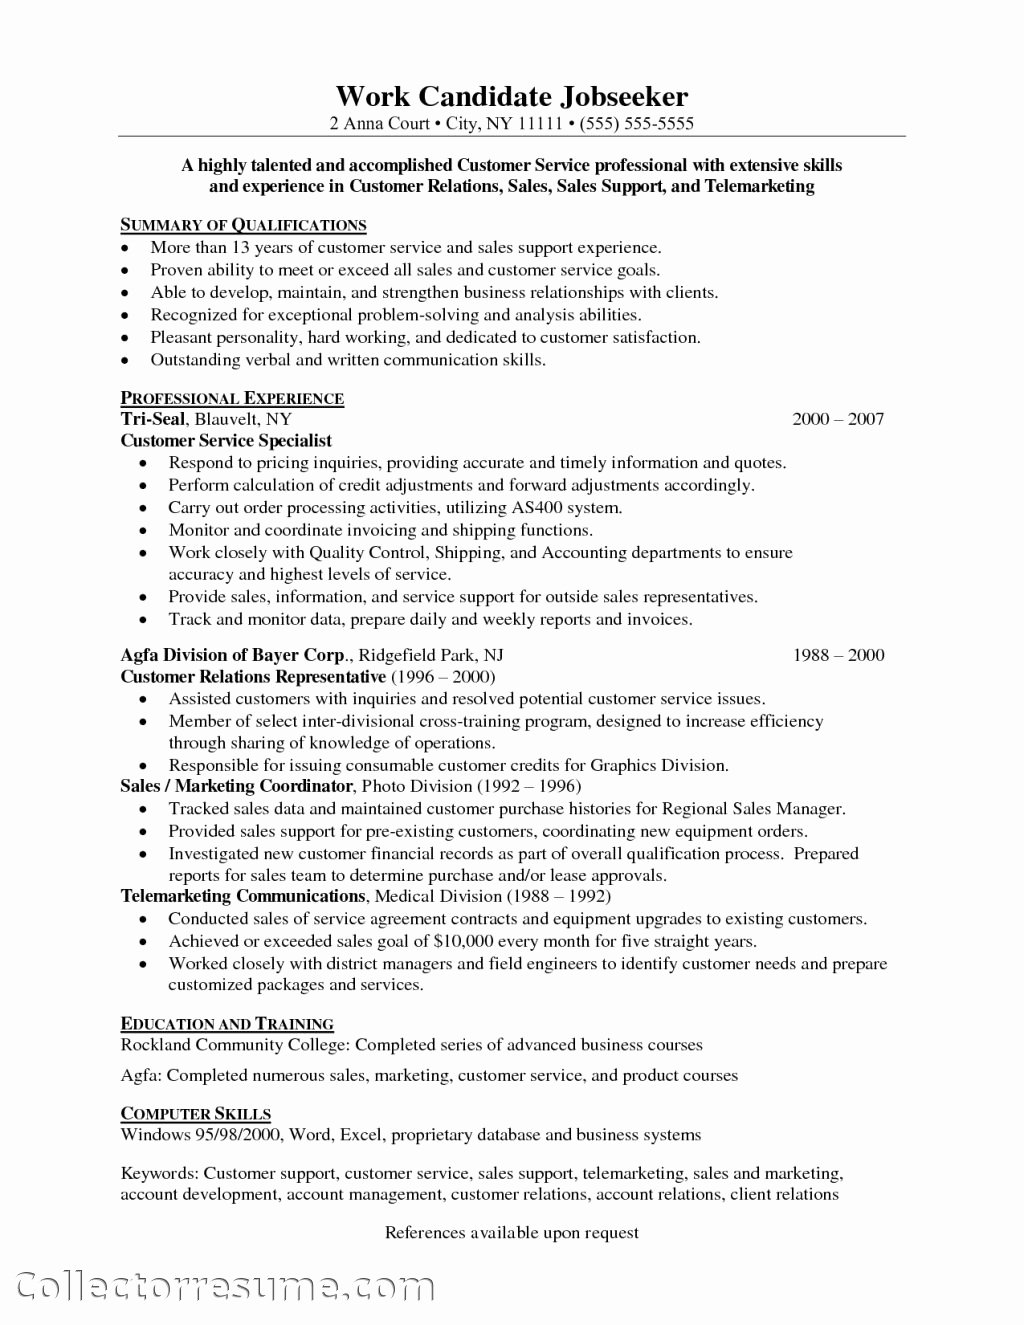 Customer Service Skills Resume Objective – Perfect Resume